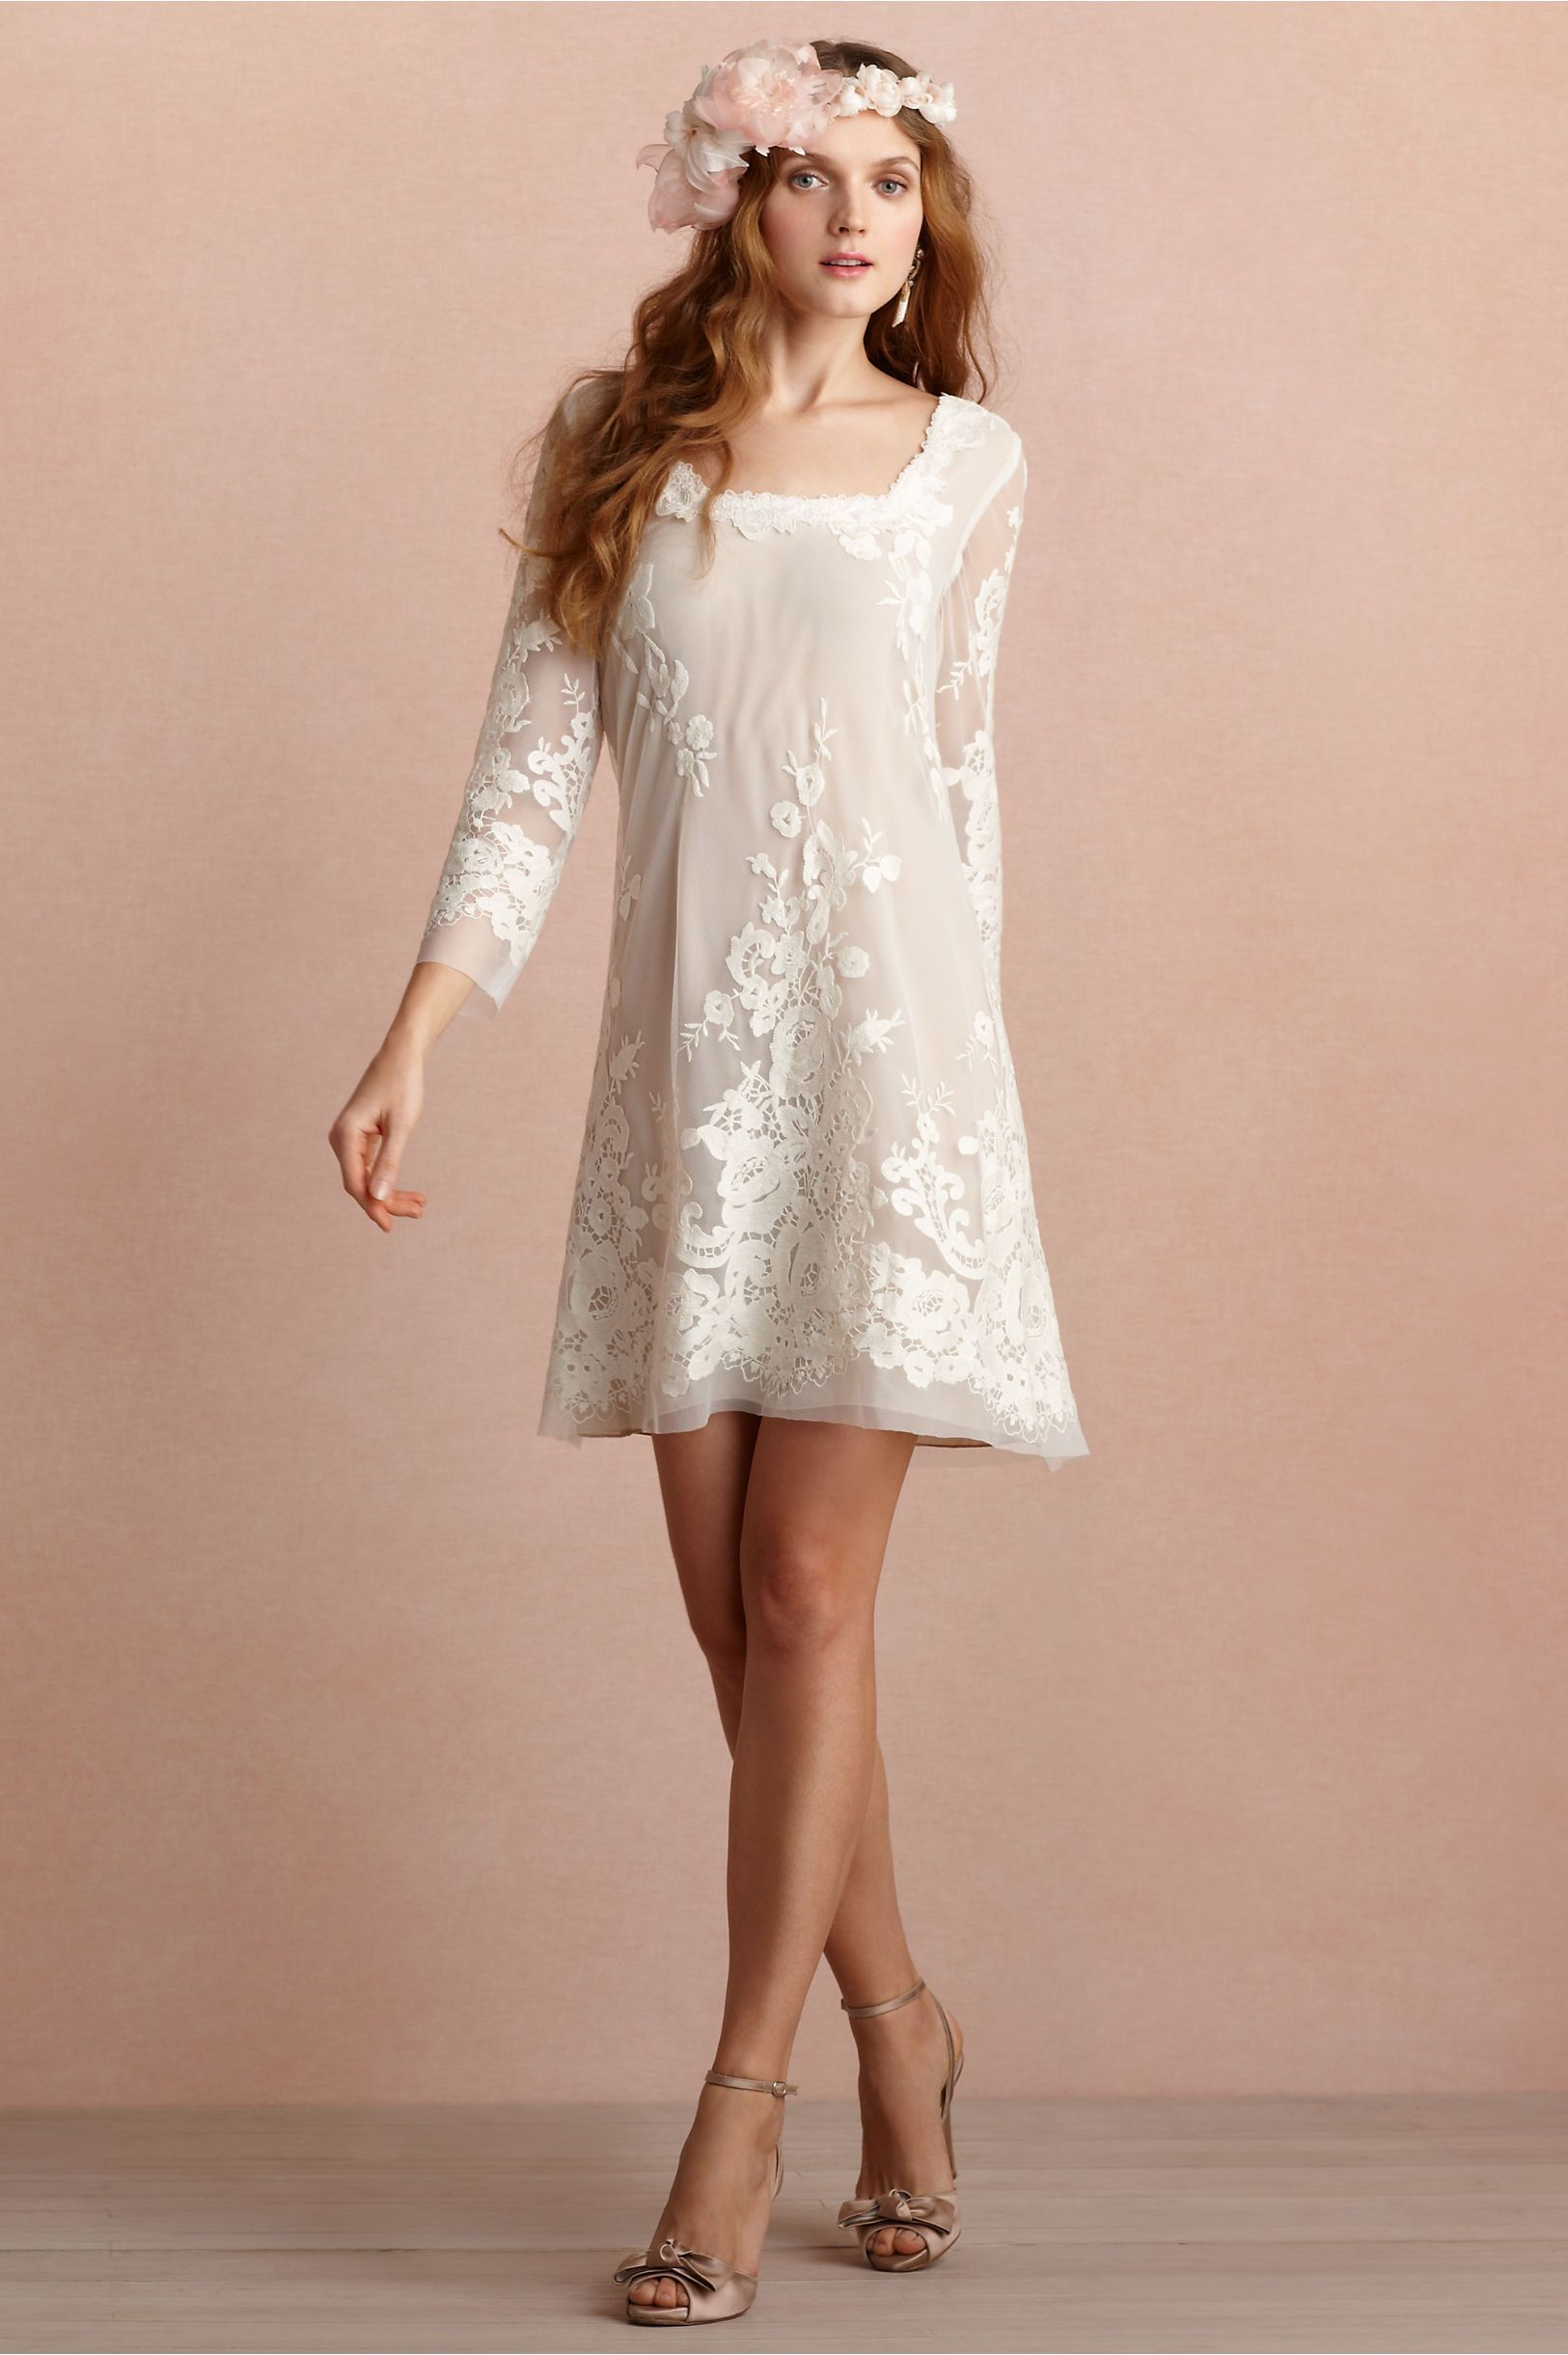 Daisy Doll Dress from BHLDN   Wedding Style   Pinterest ...